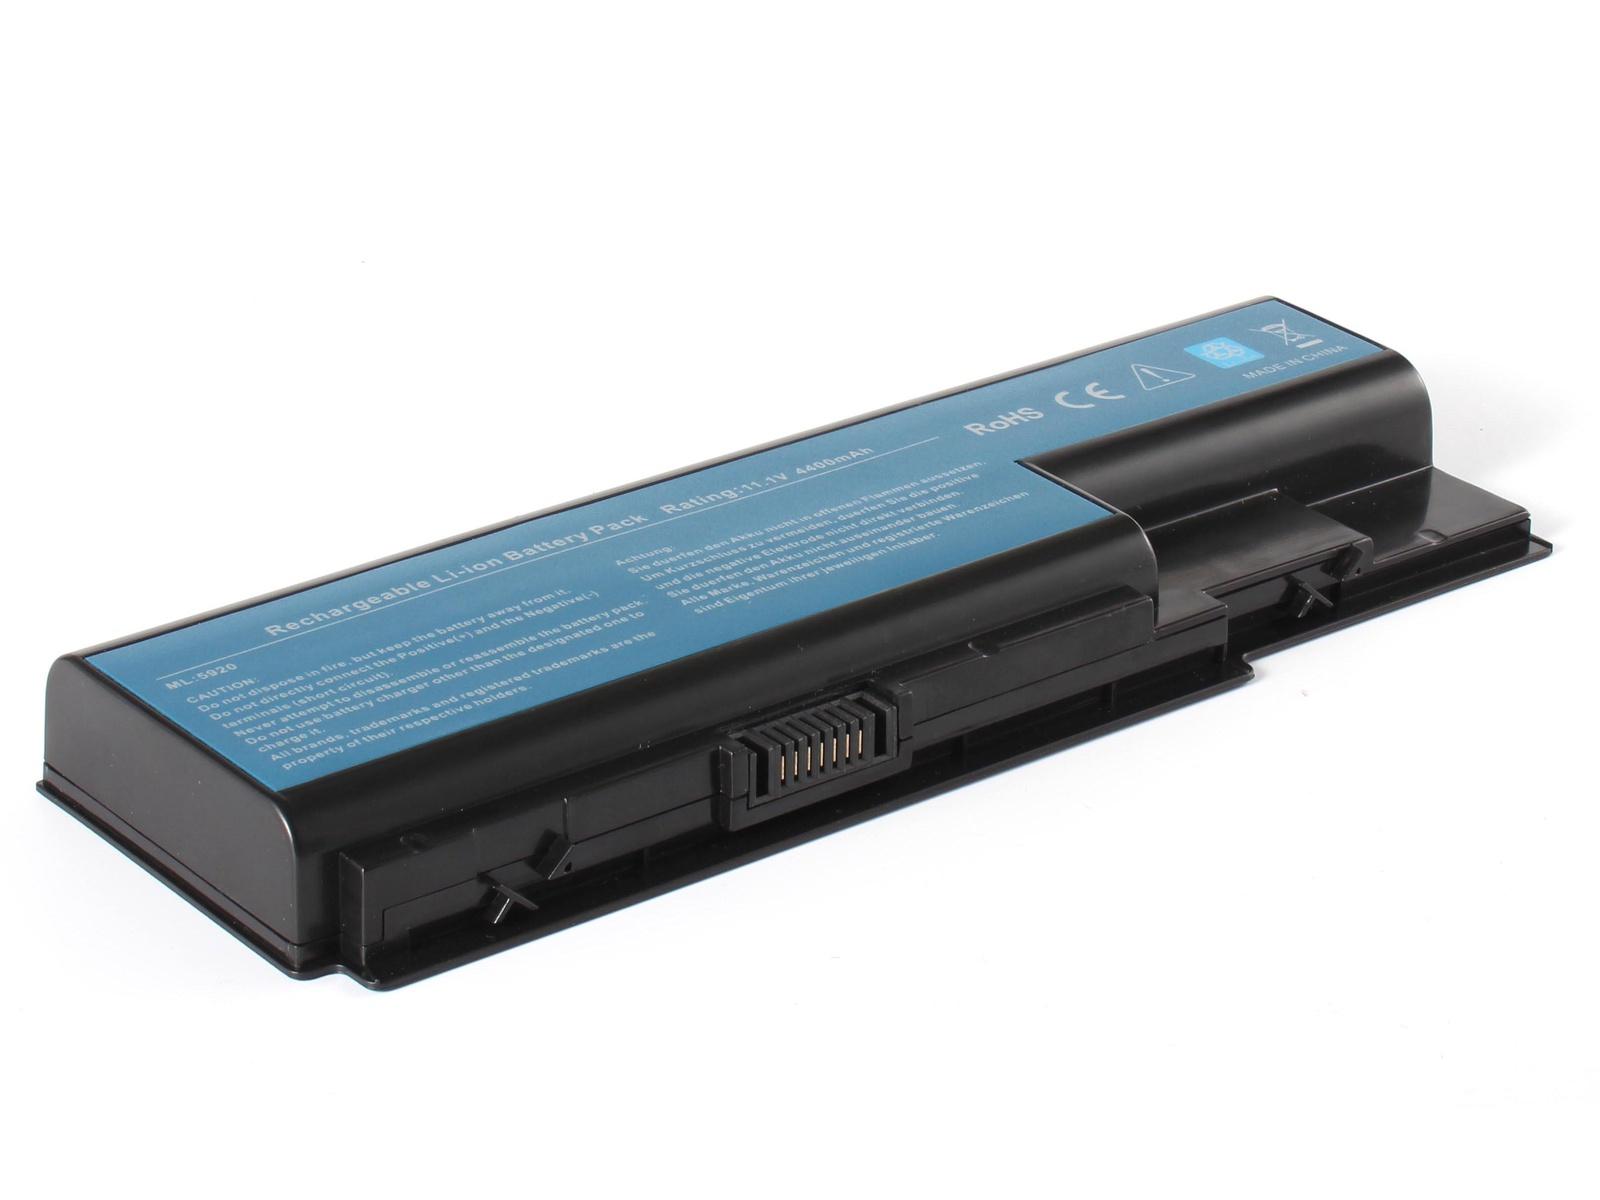 Аккумулятор для ноутбука AnyBatt для Acer Aspire 5739G-664G32Mi, Aspire 5730G, Aspire 7735, Aspire 7735Z, Aspire 5739G-874G50Mi, Aspire 8942G-334G32Mi, Aspire 6930ZG, Aspire 5300, Aspire 5530G-803G25Mi, Aspire 5930Z ноутбук acer aspire 8942g